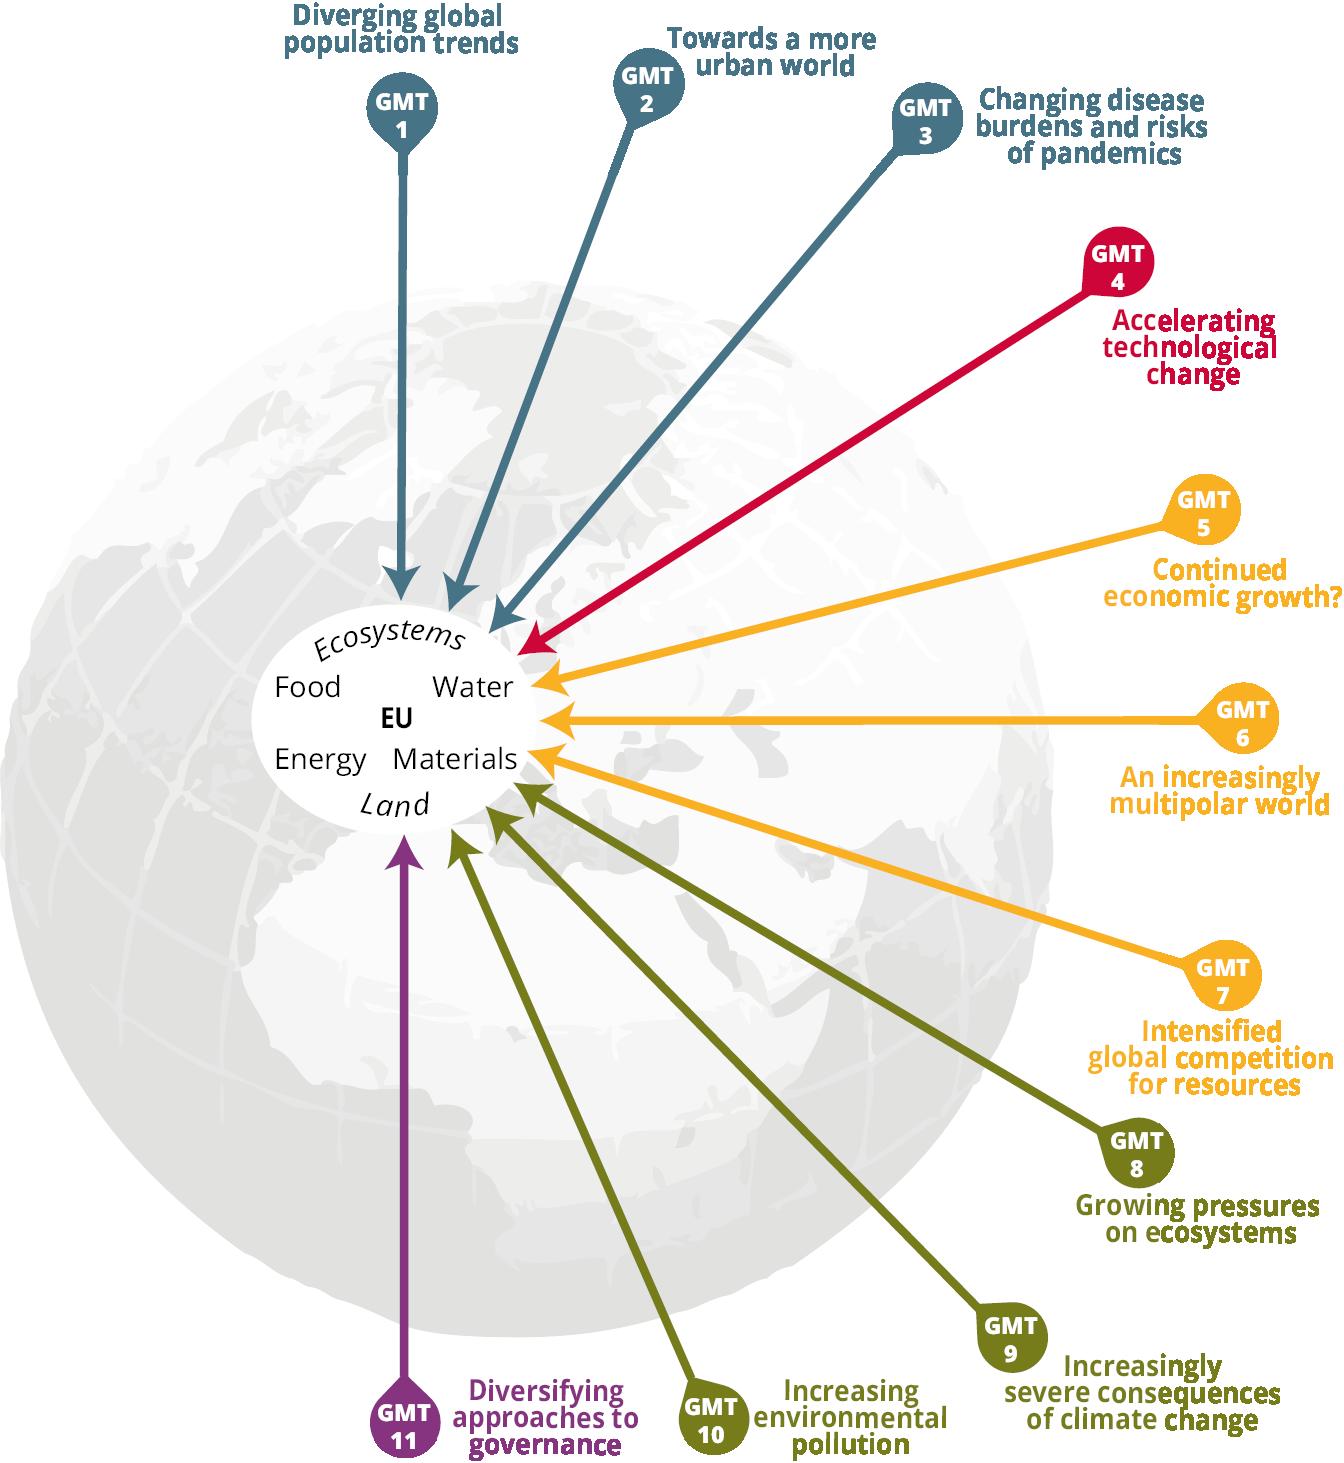 Figure 2.2 Global megatrends